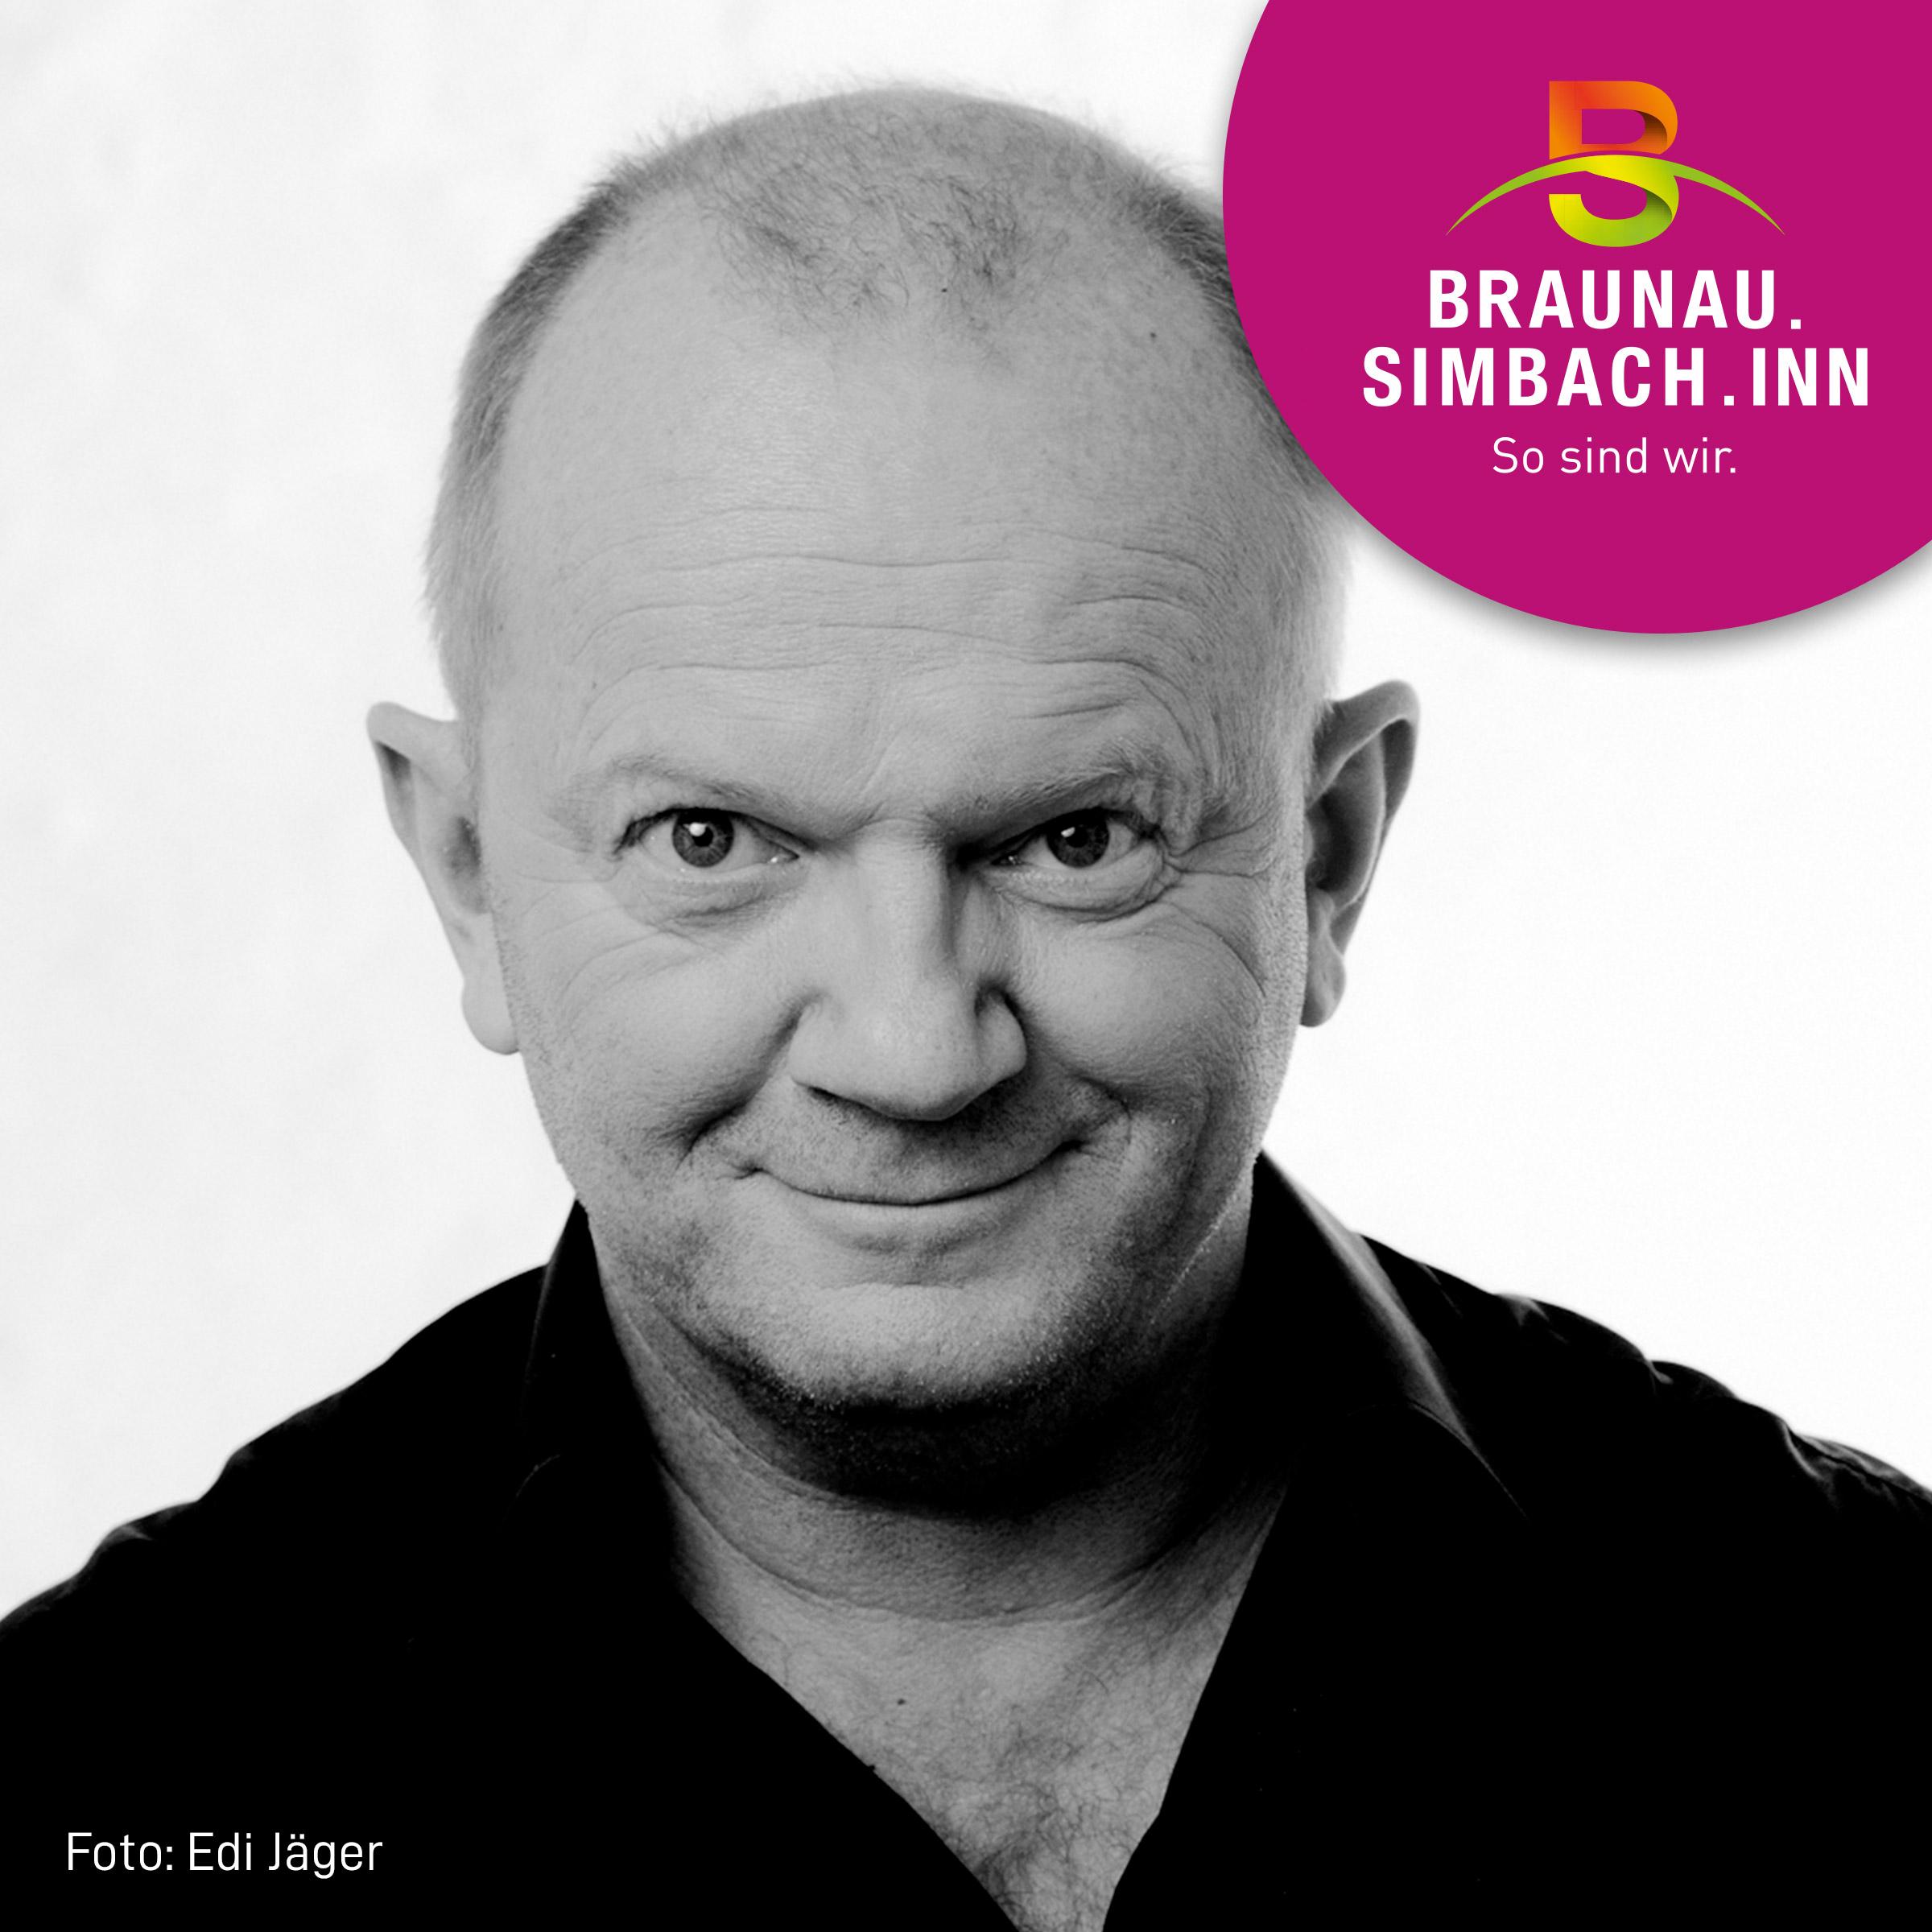 ficken in Braunau am Inn - Erotik & Sex - volunteeralert.com